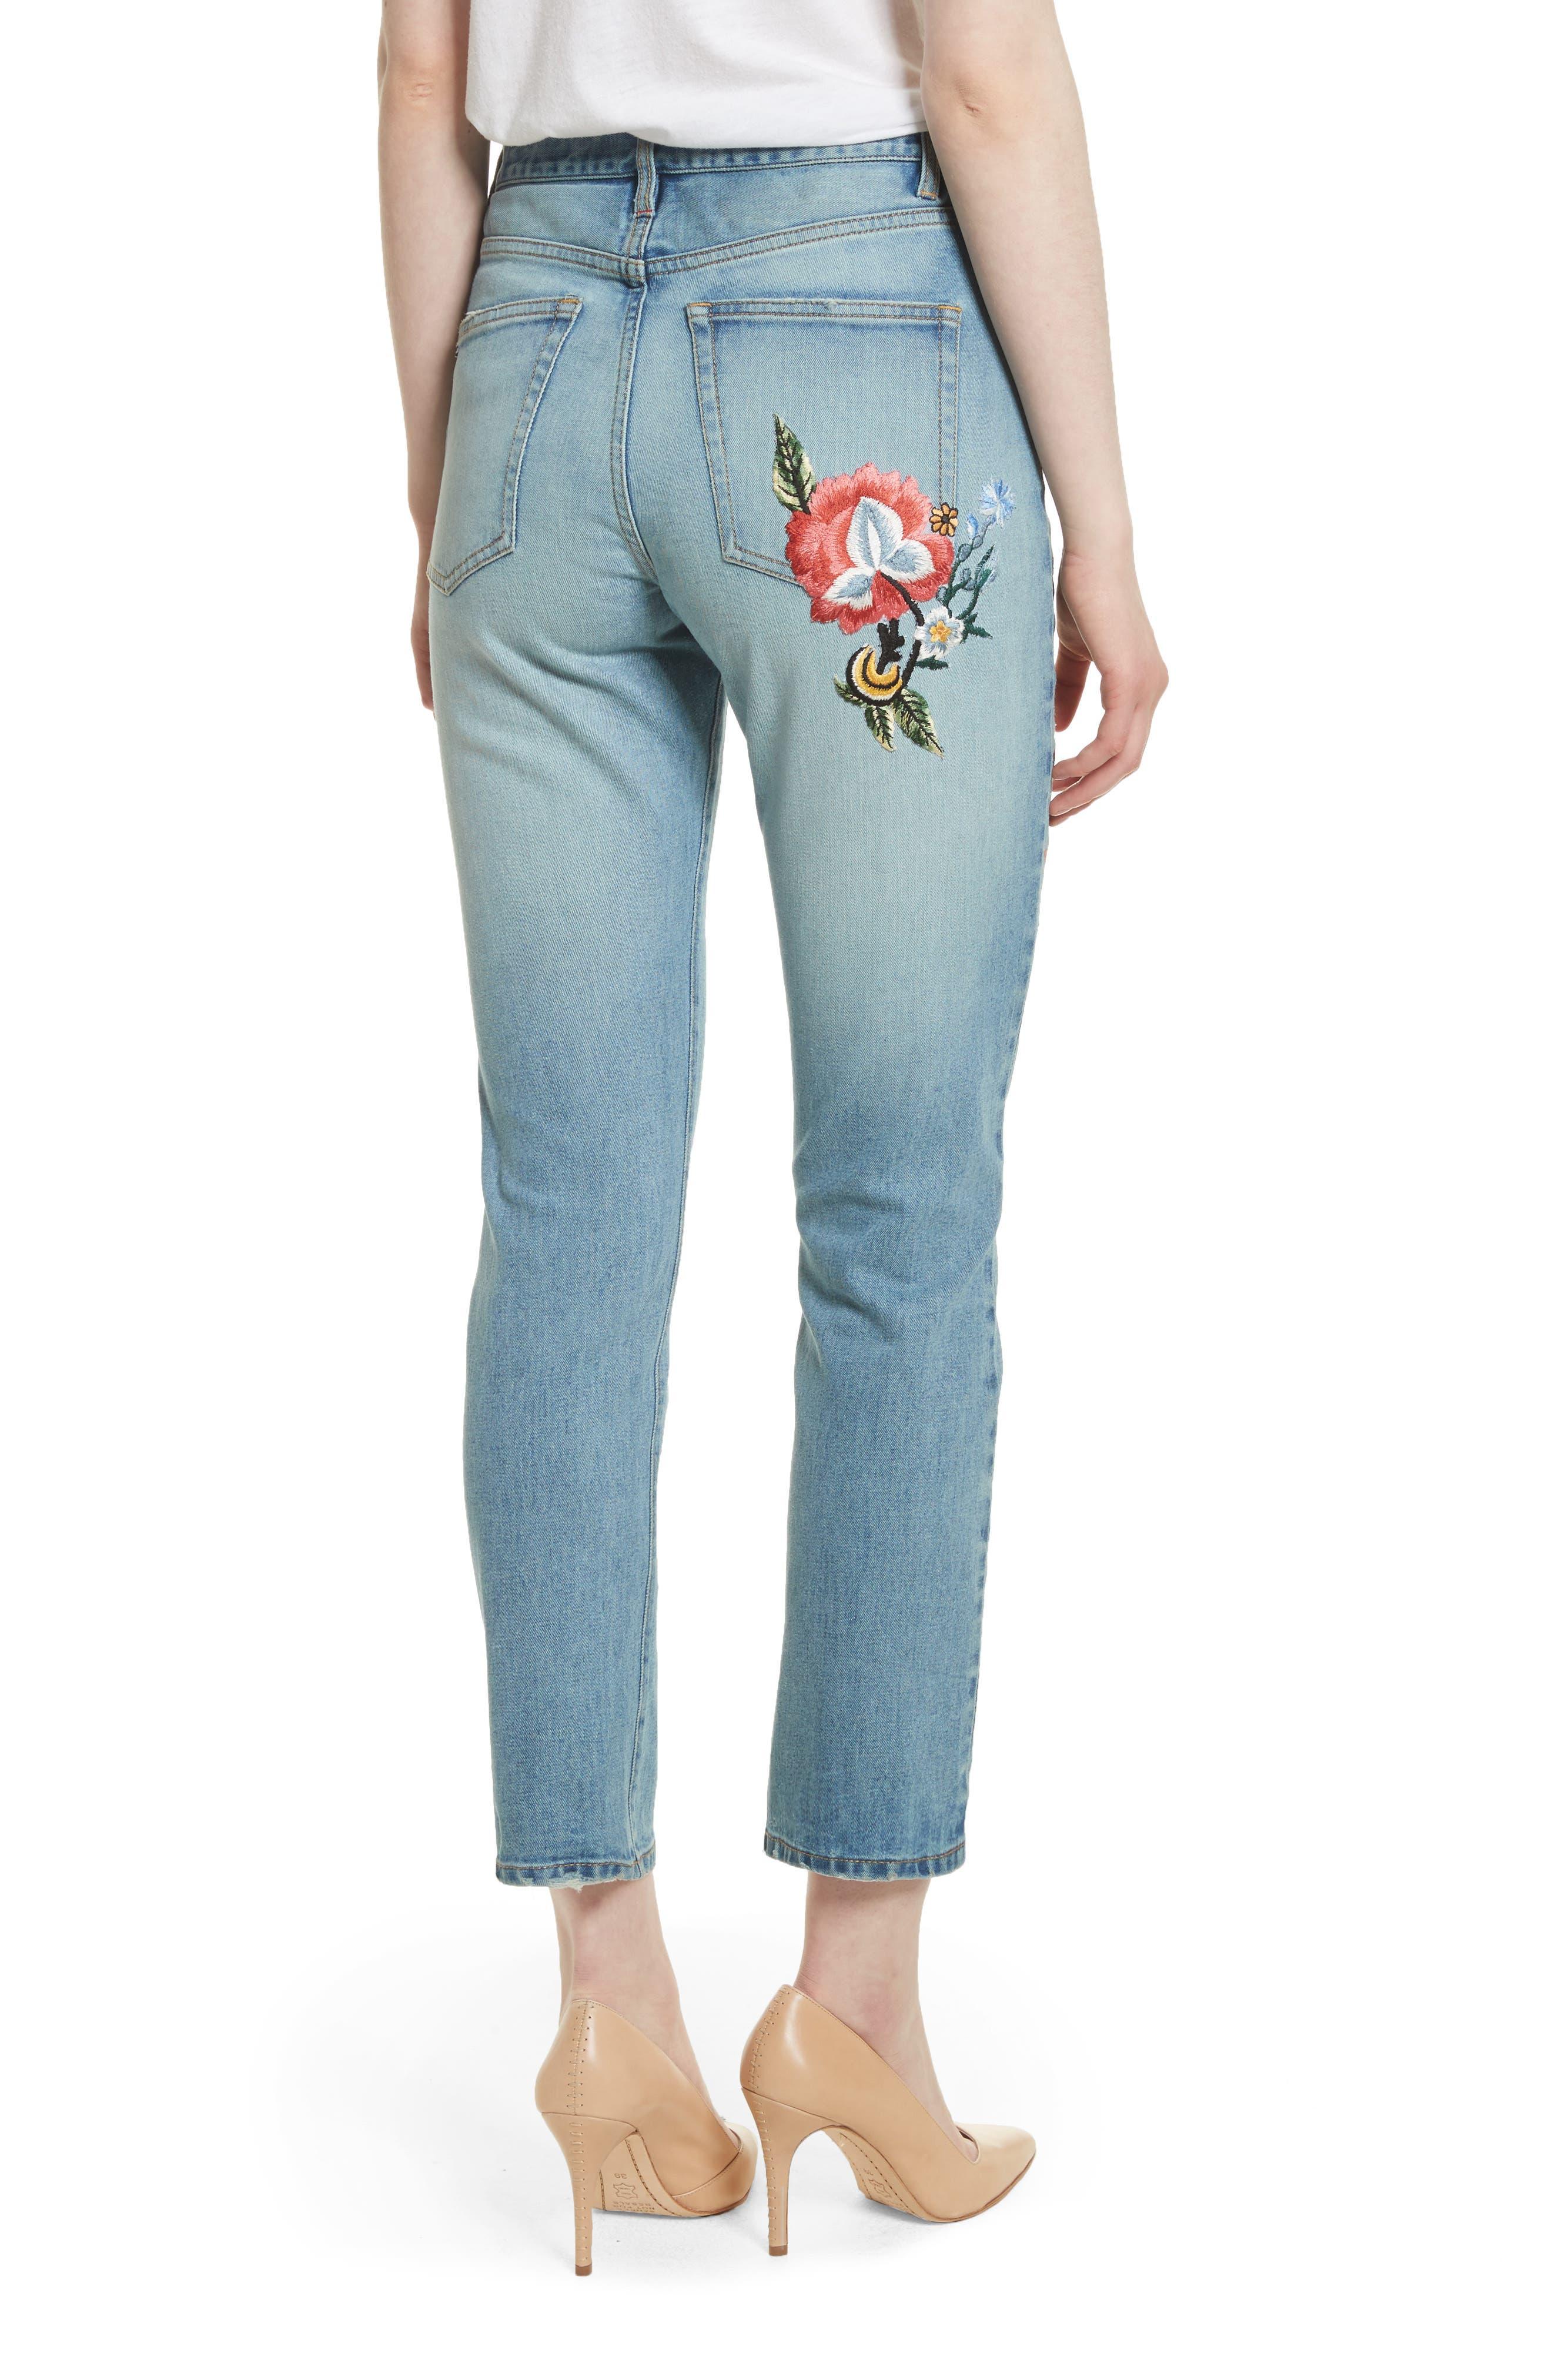 AO.LA Amazing Embroidered Slim Crop Jeans,                             Alternate thumbnail 2, color,                             Multi